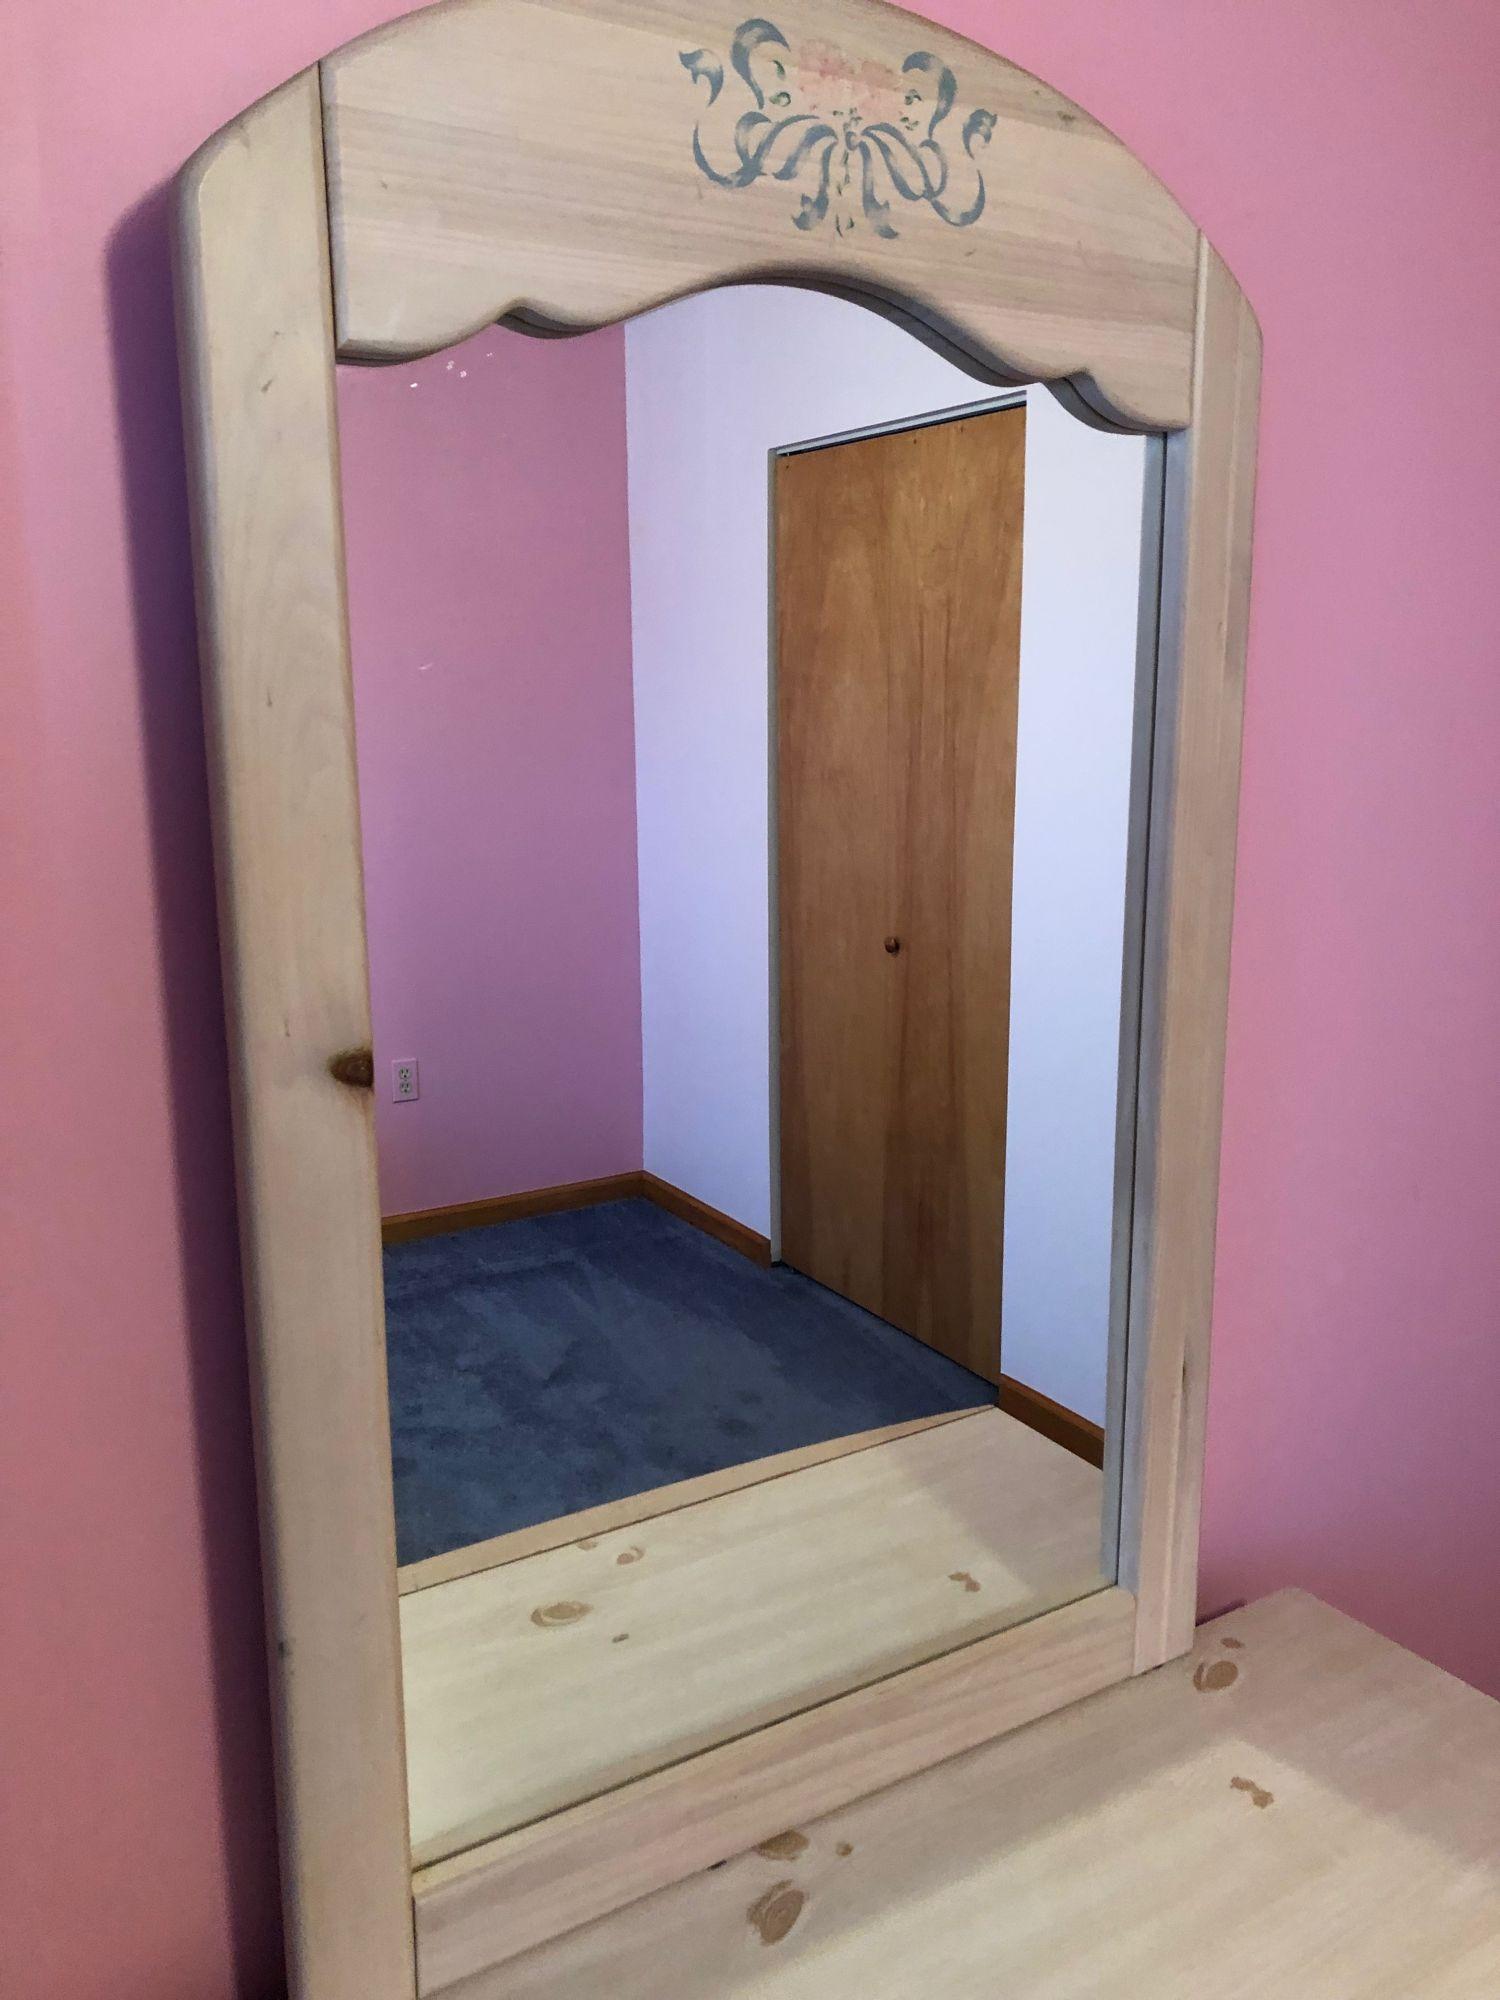 GIRLS BEDROOM SUITE - For Sale - Furniture - Paper Shop - Free ...